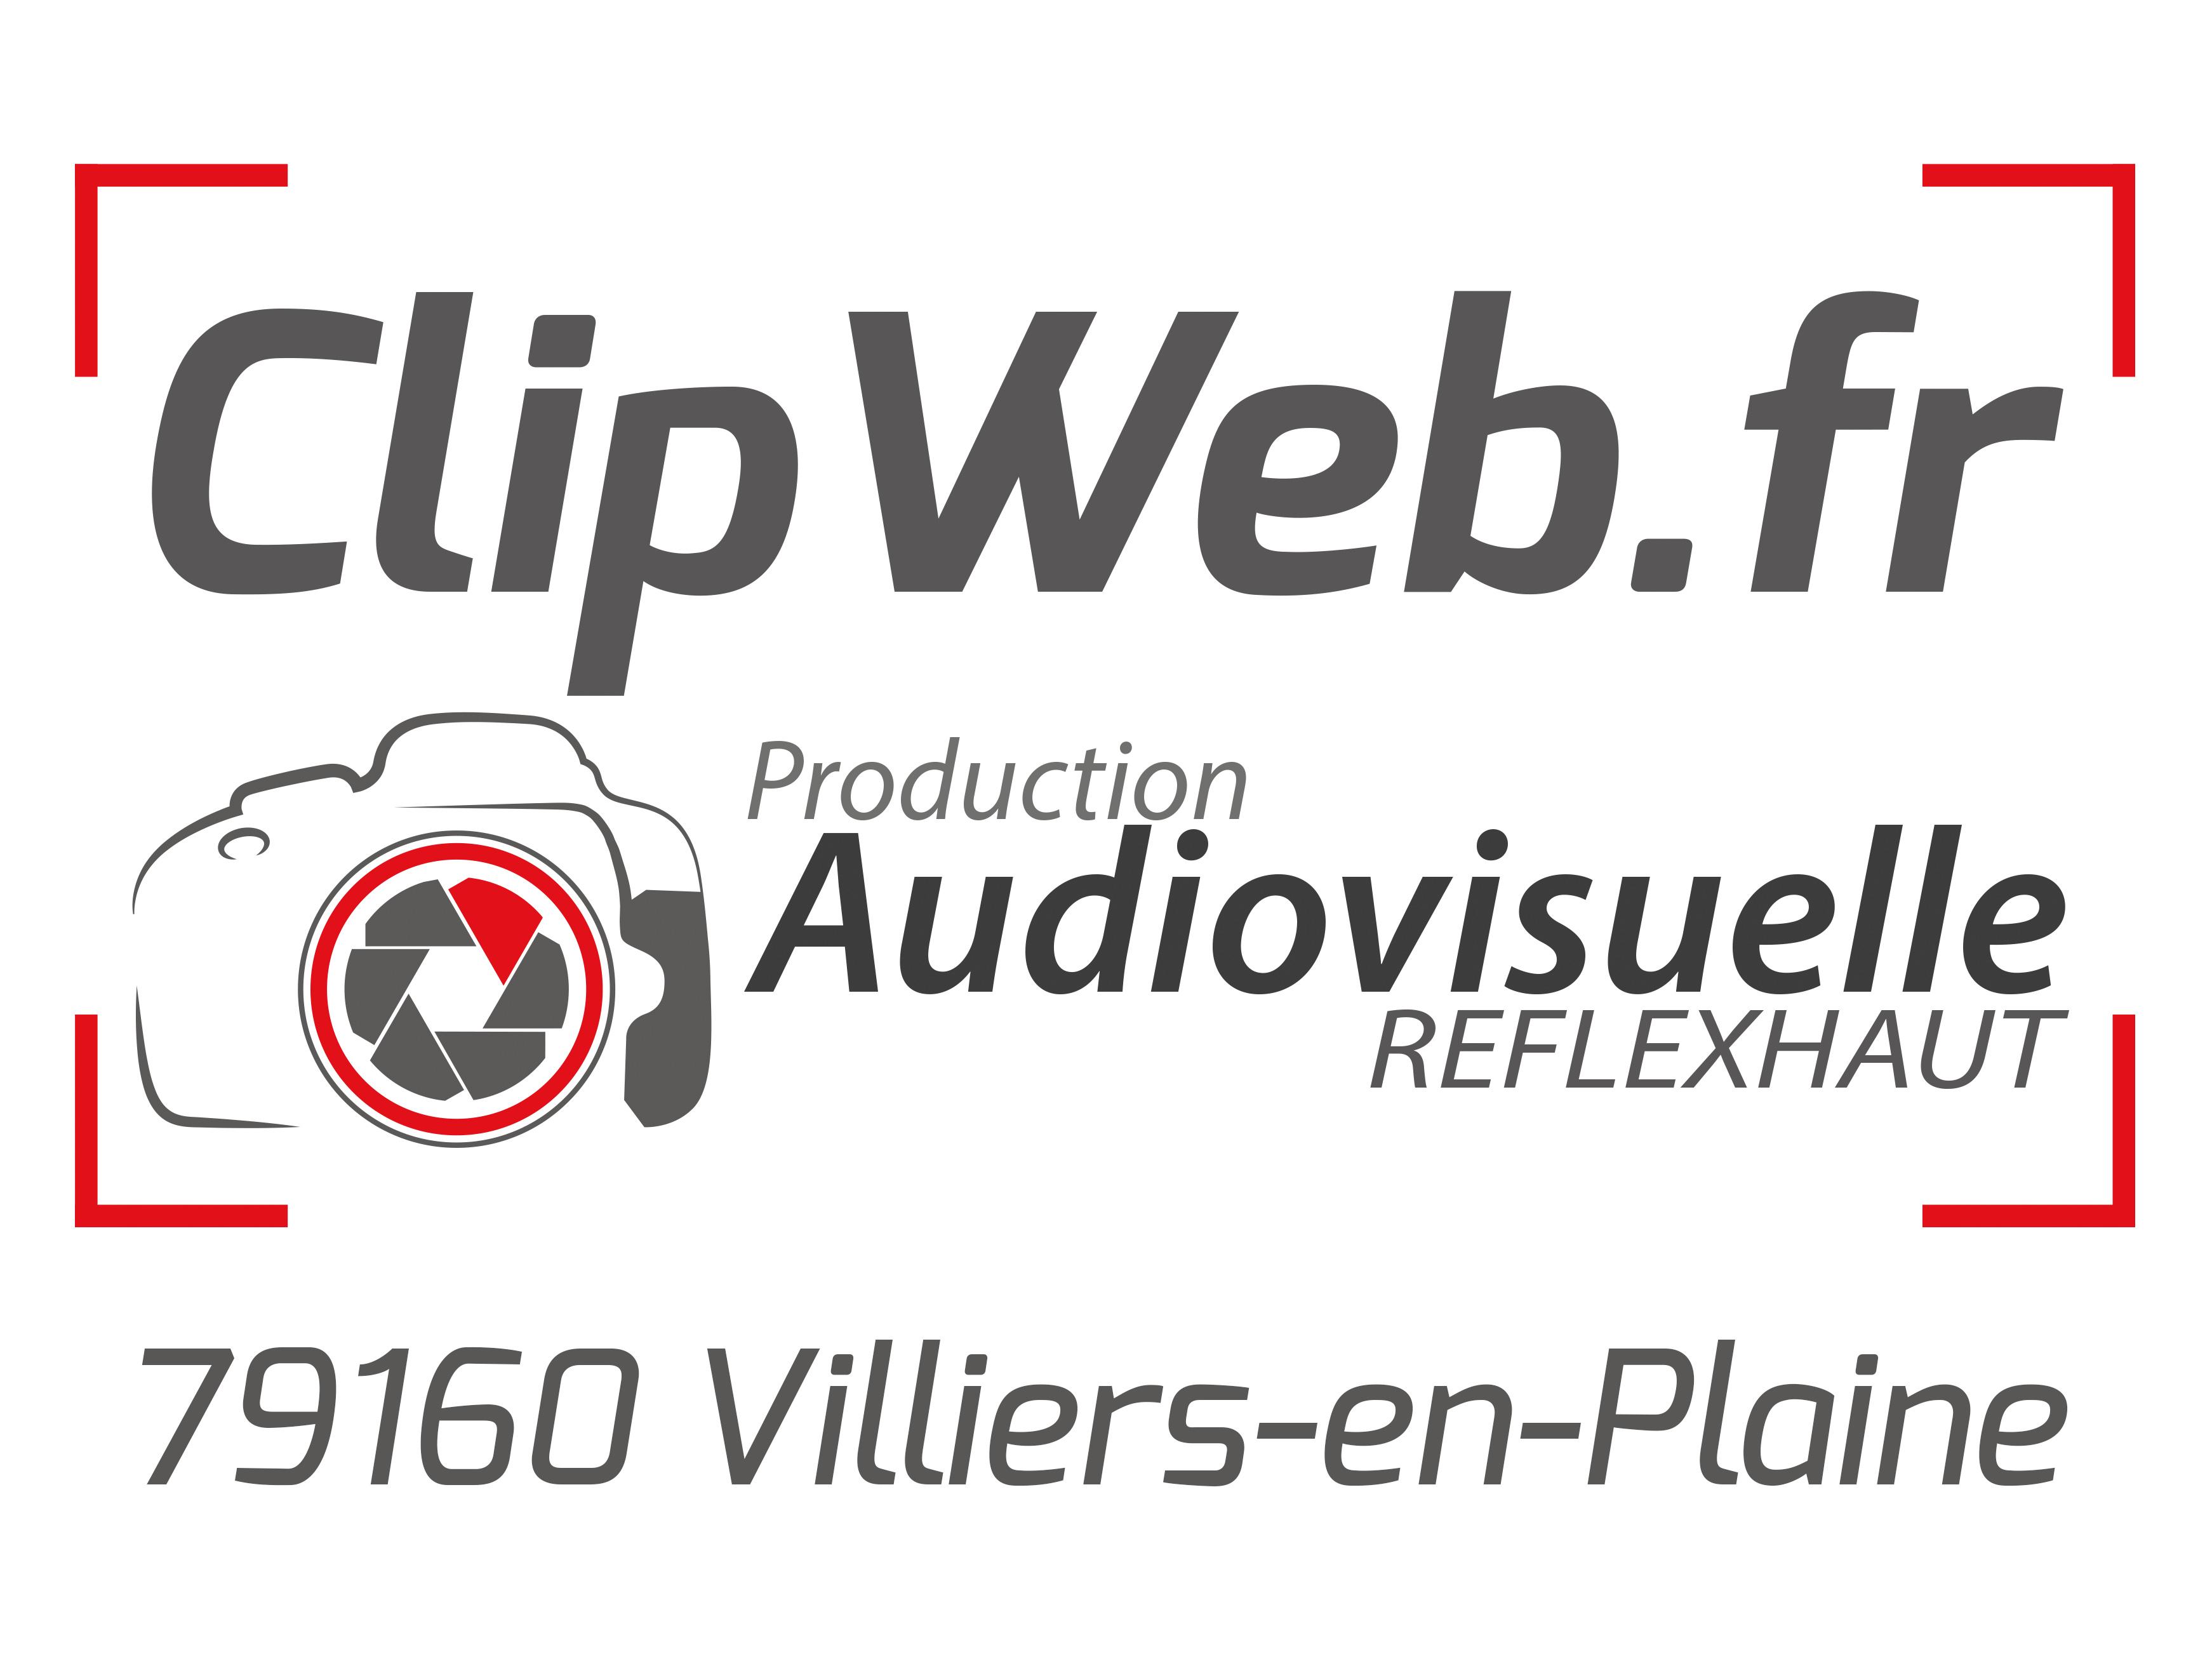 CLIPWEB.FR